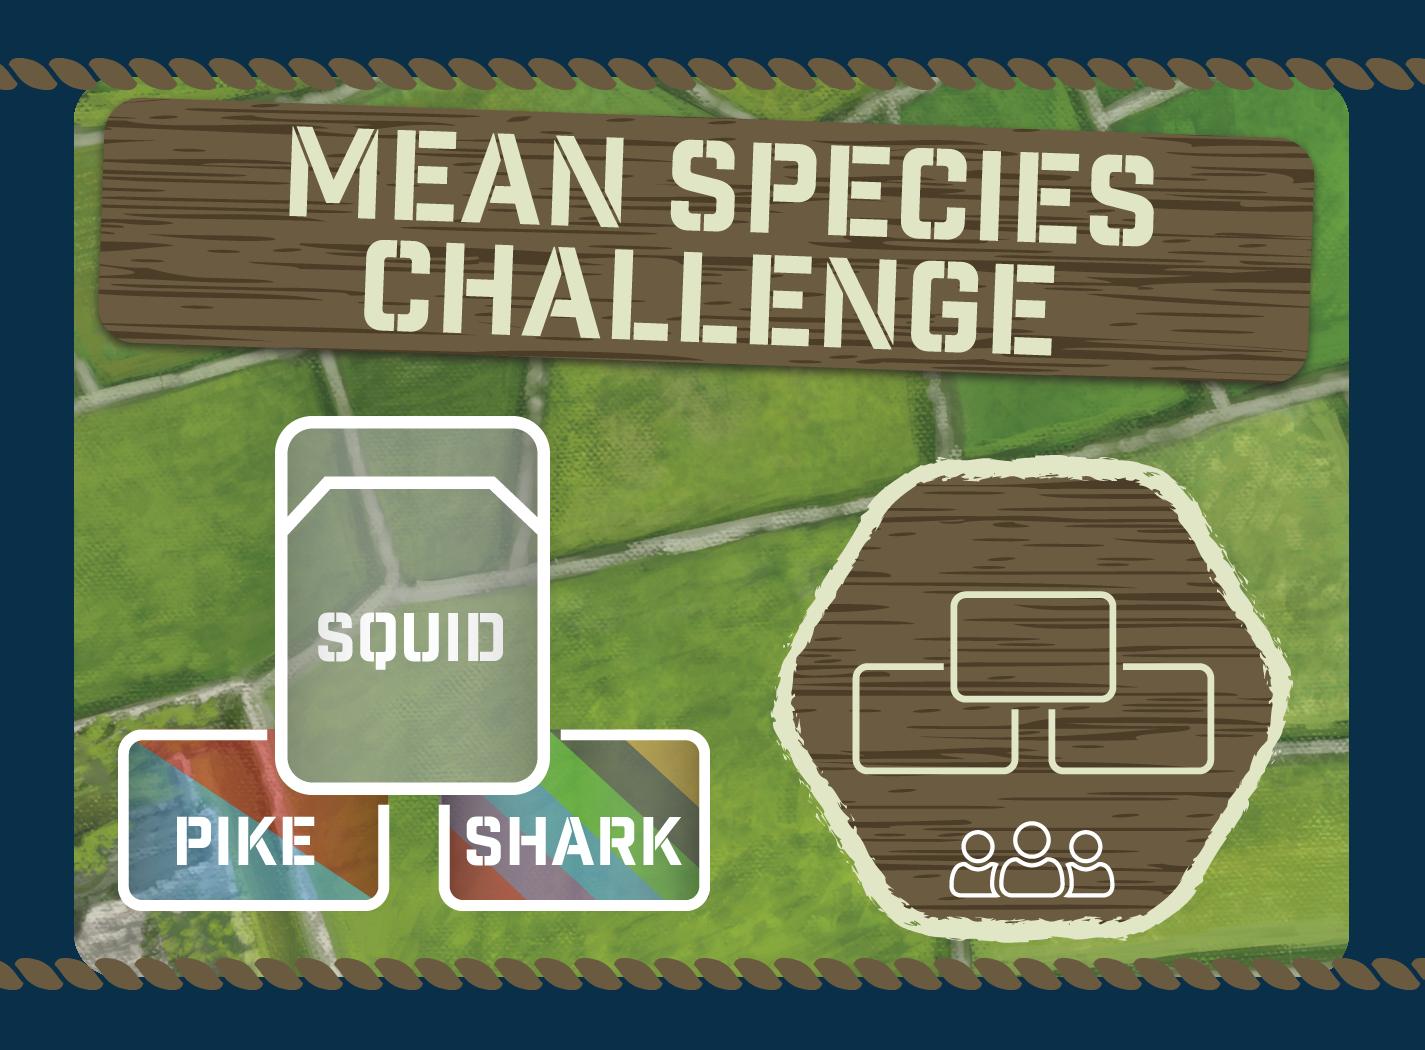 mean species front.png